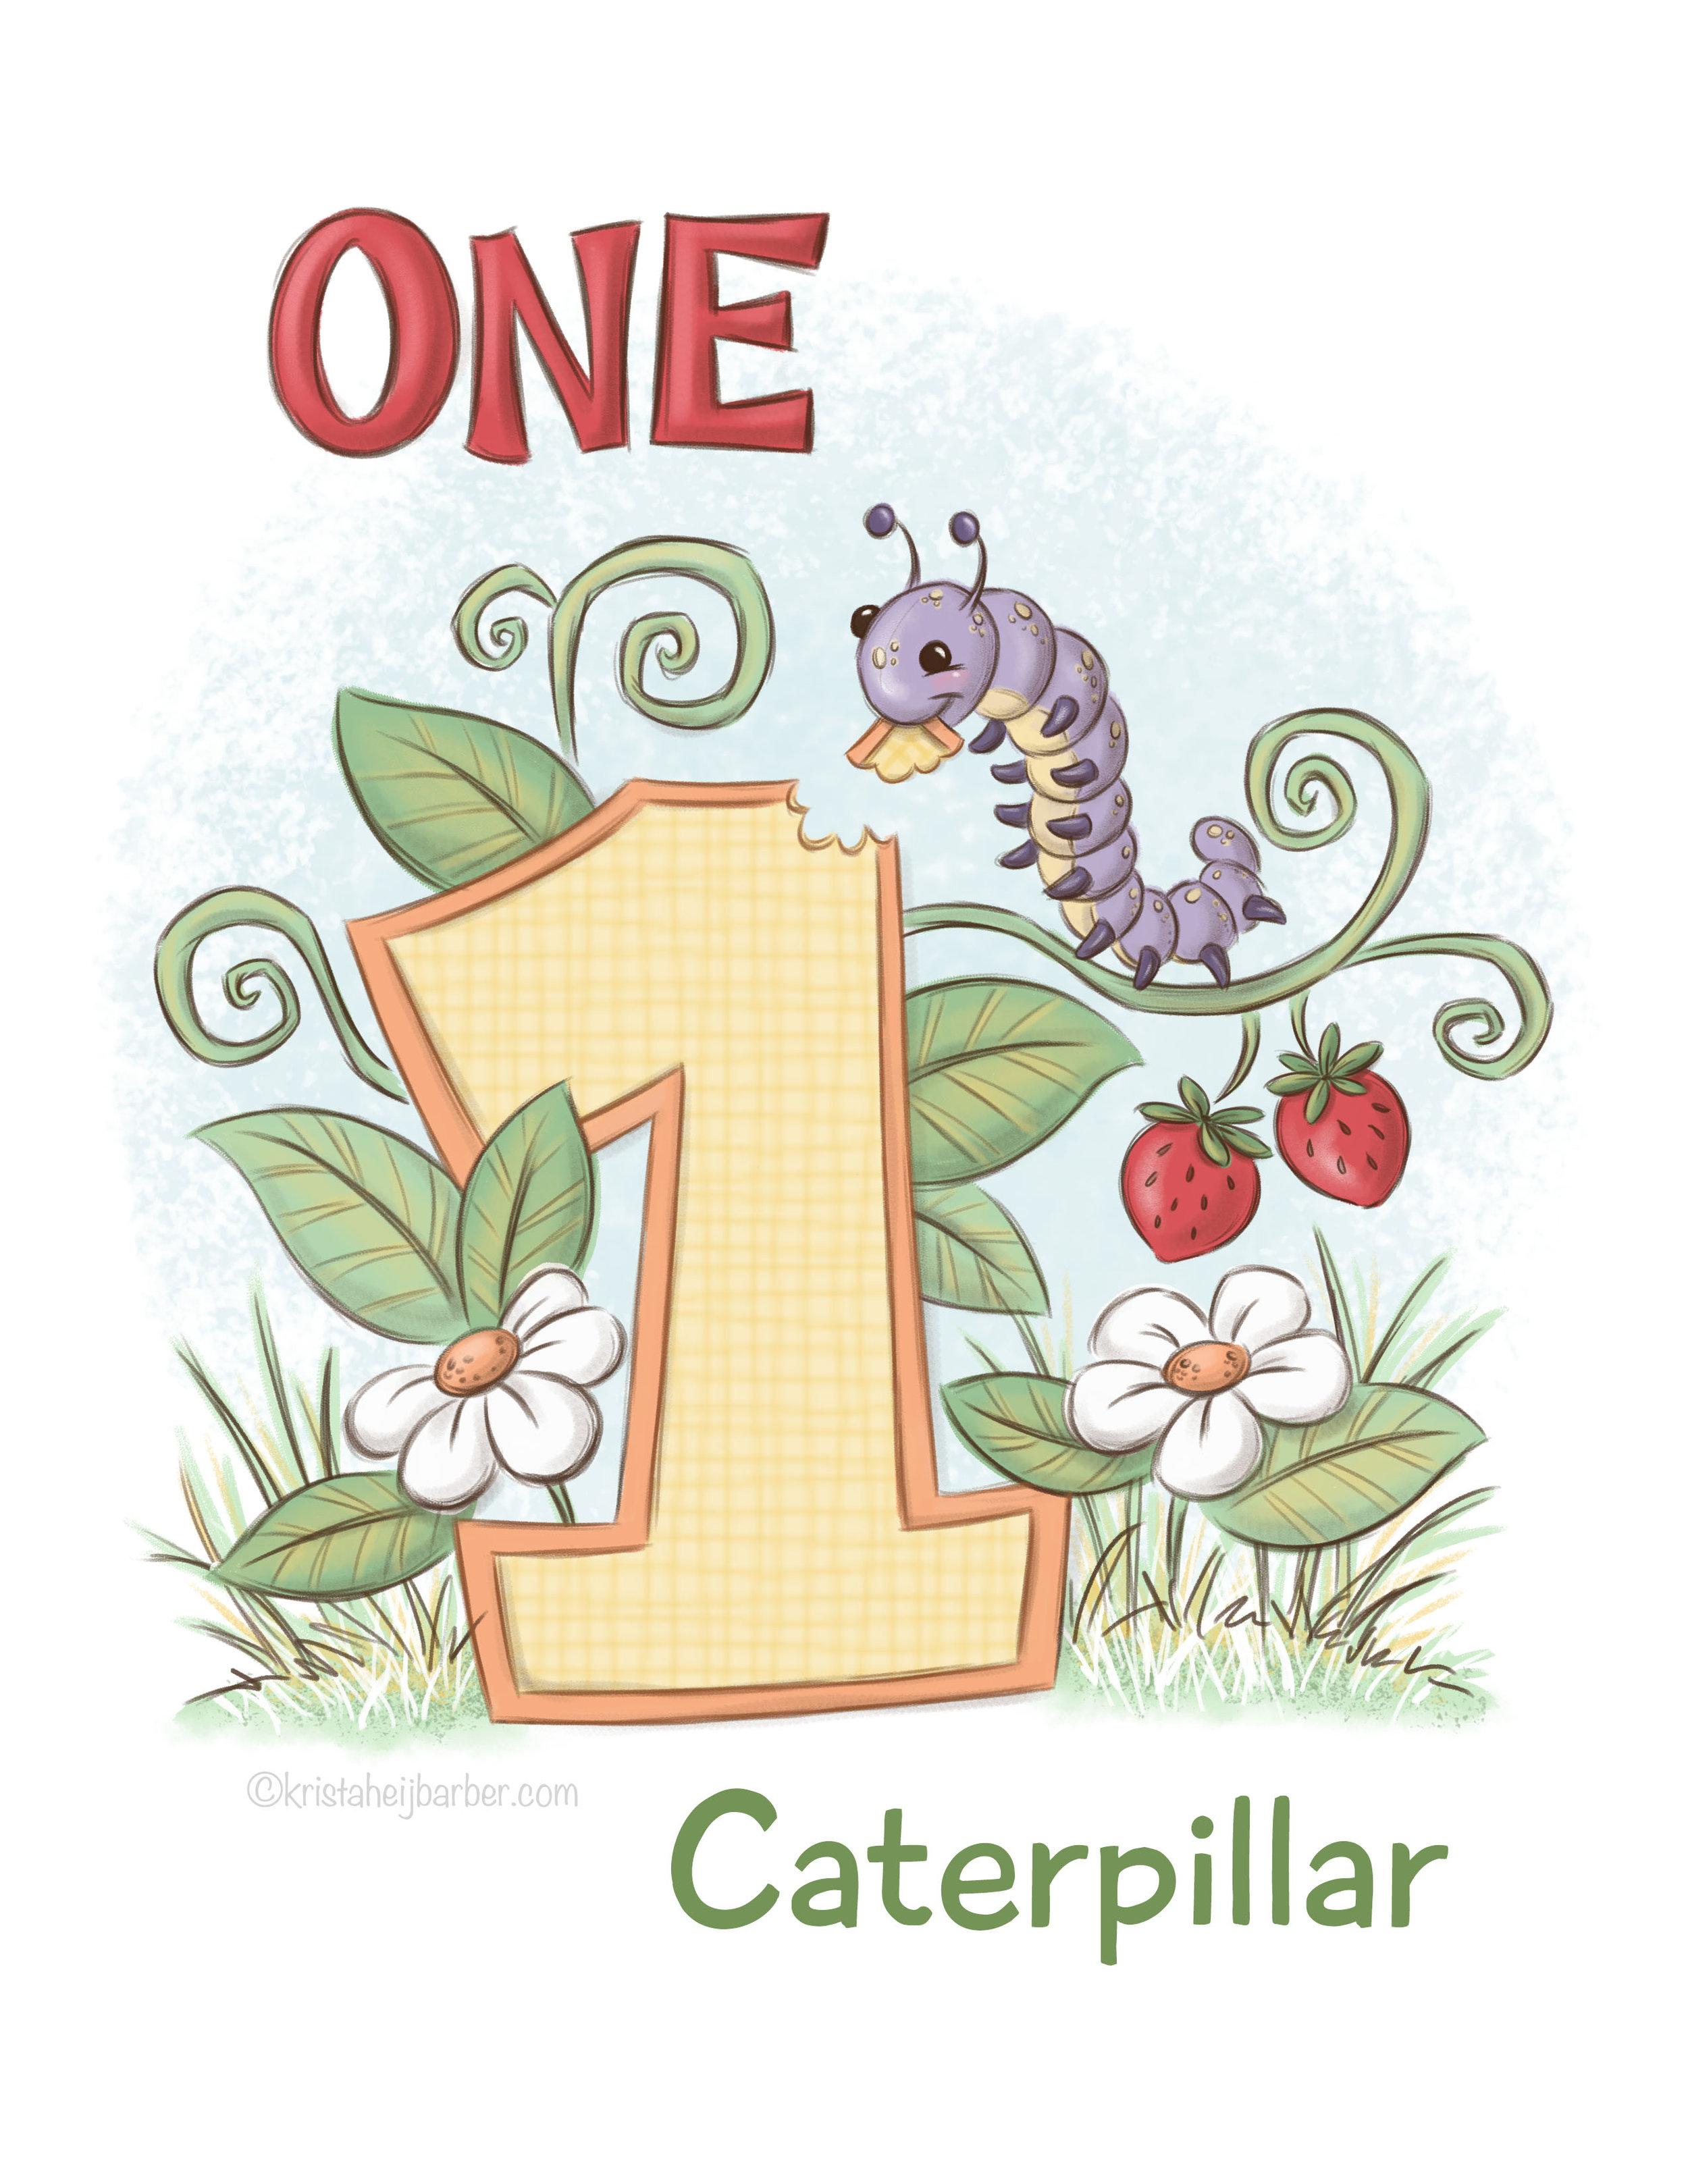 1-Caterpillar.jpg